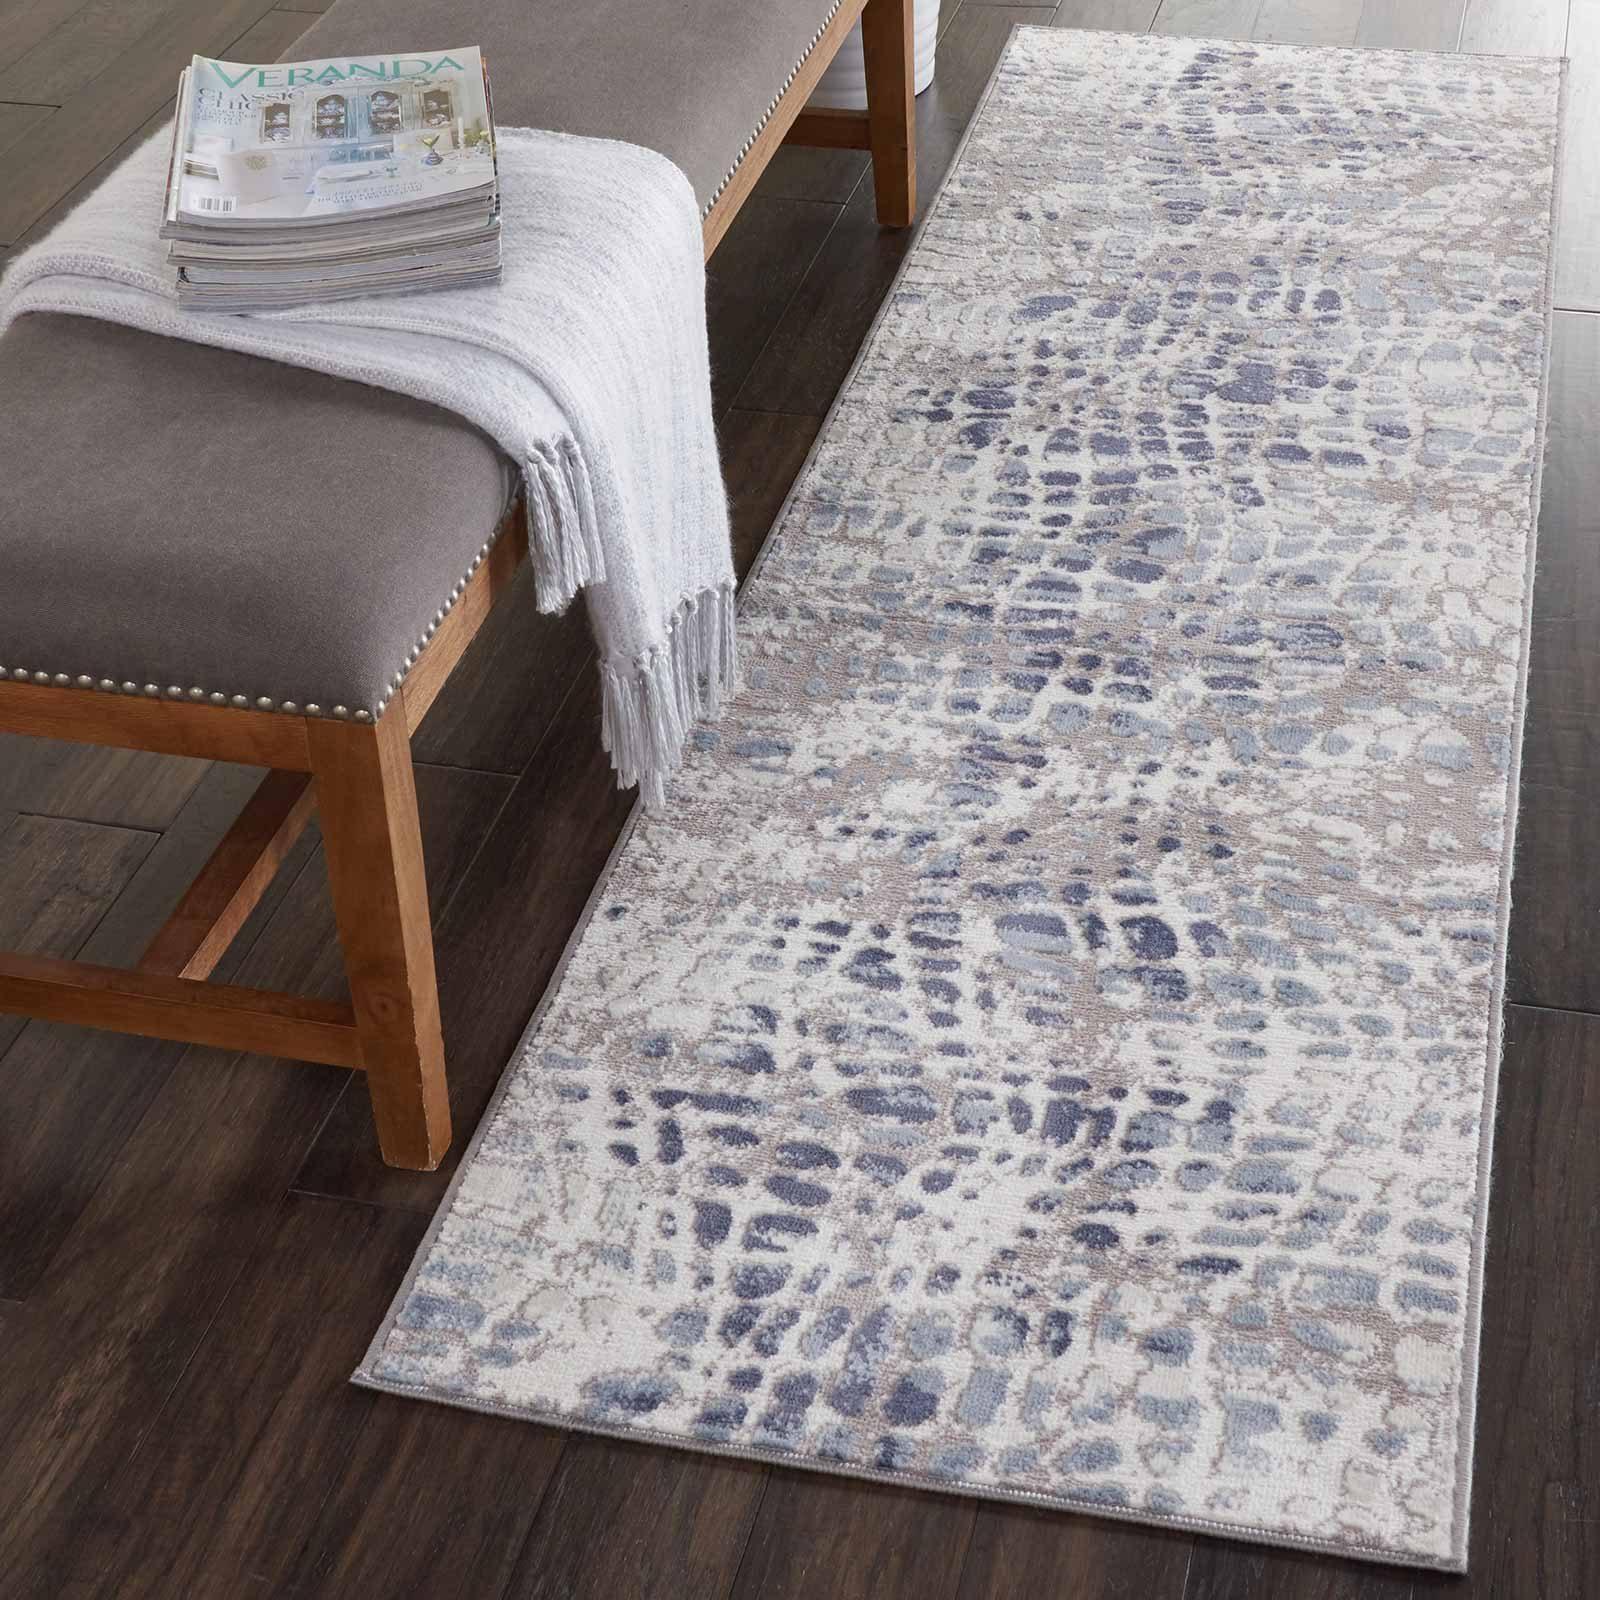 Nourison rug Urban Decor URD04 IVGRY 2X8 099446467096 interior 1 C